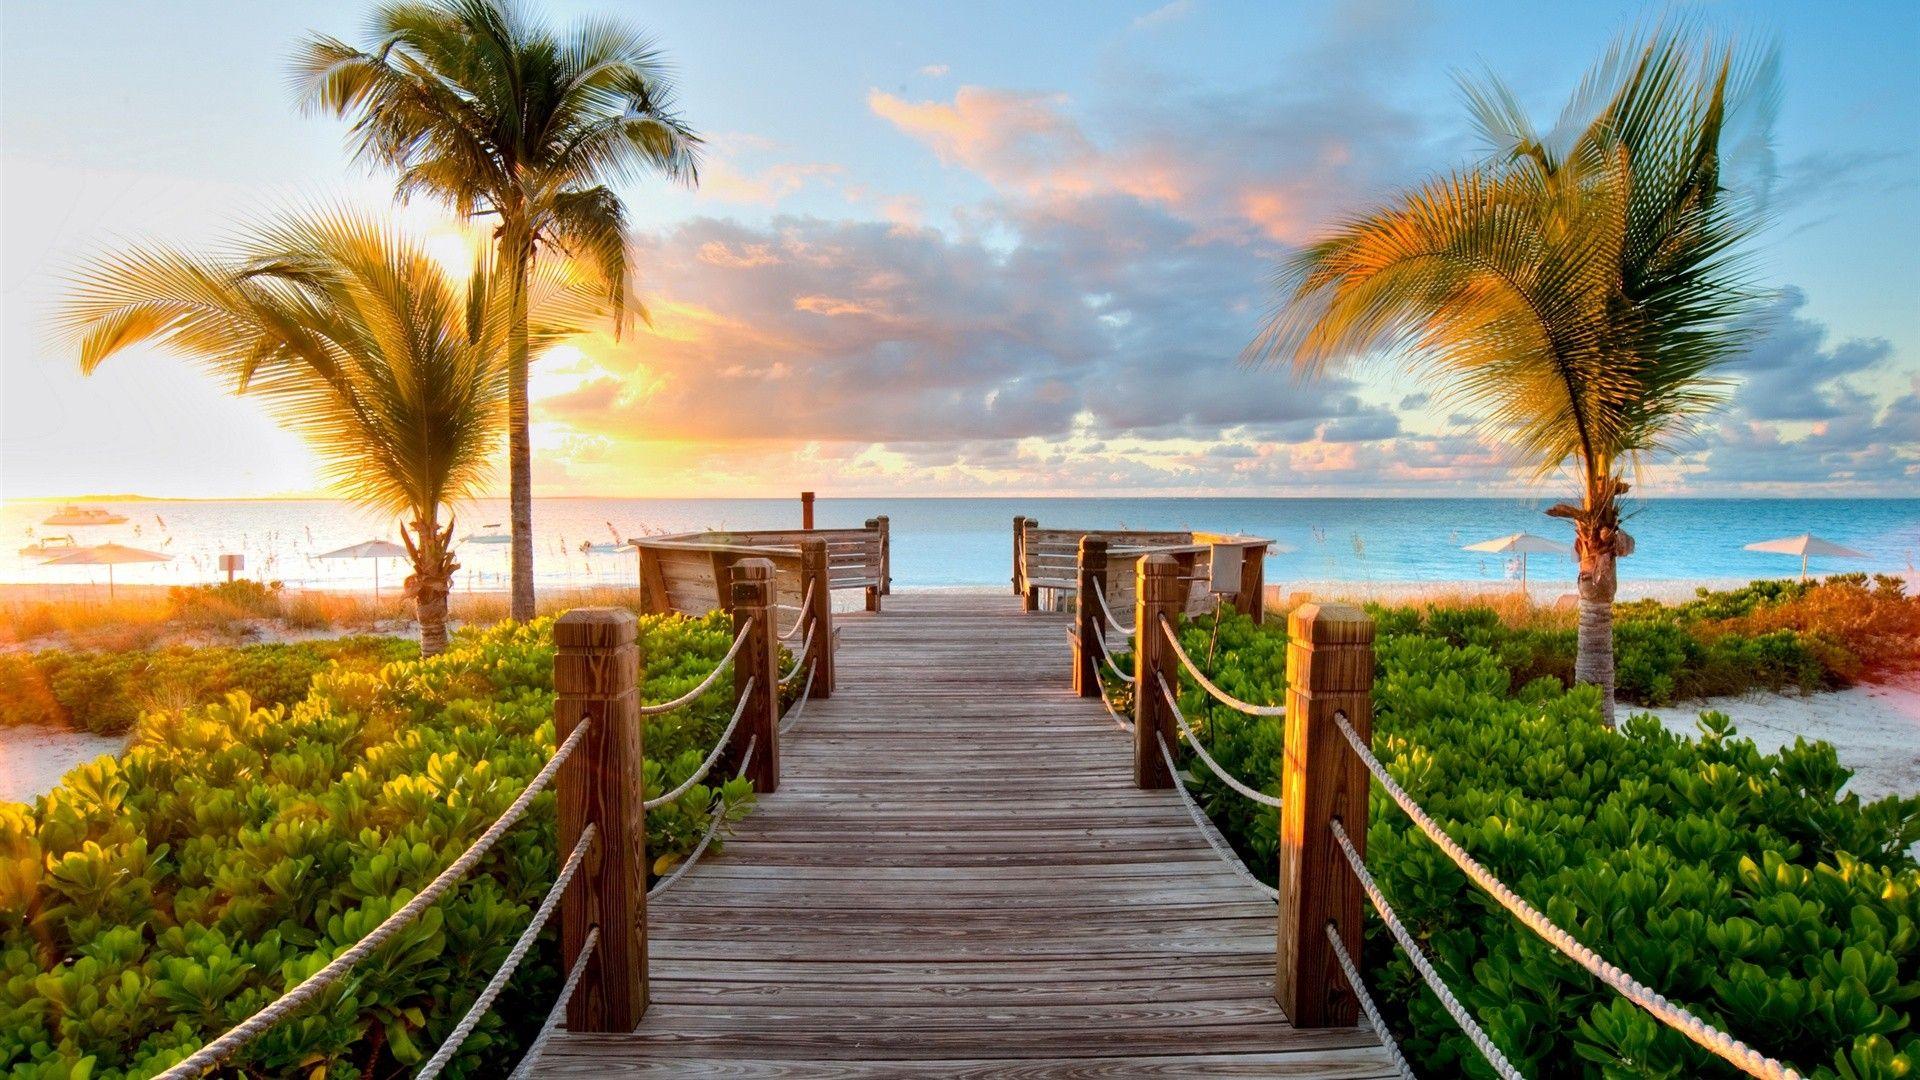 Caribbean Background